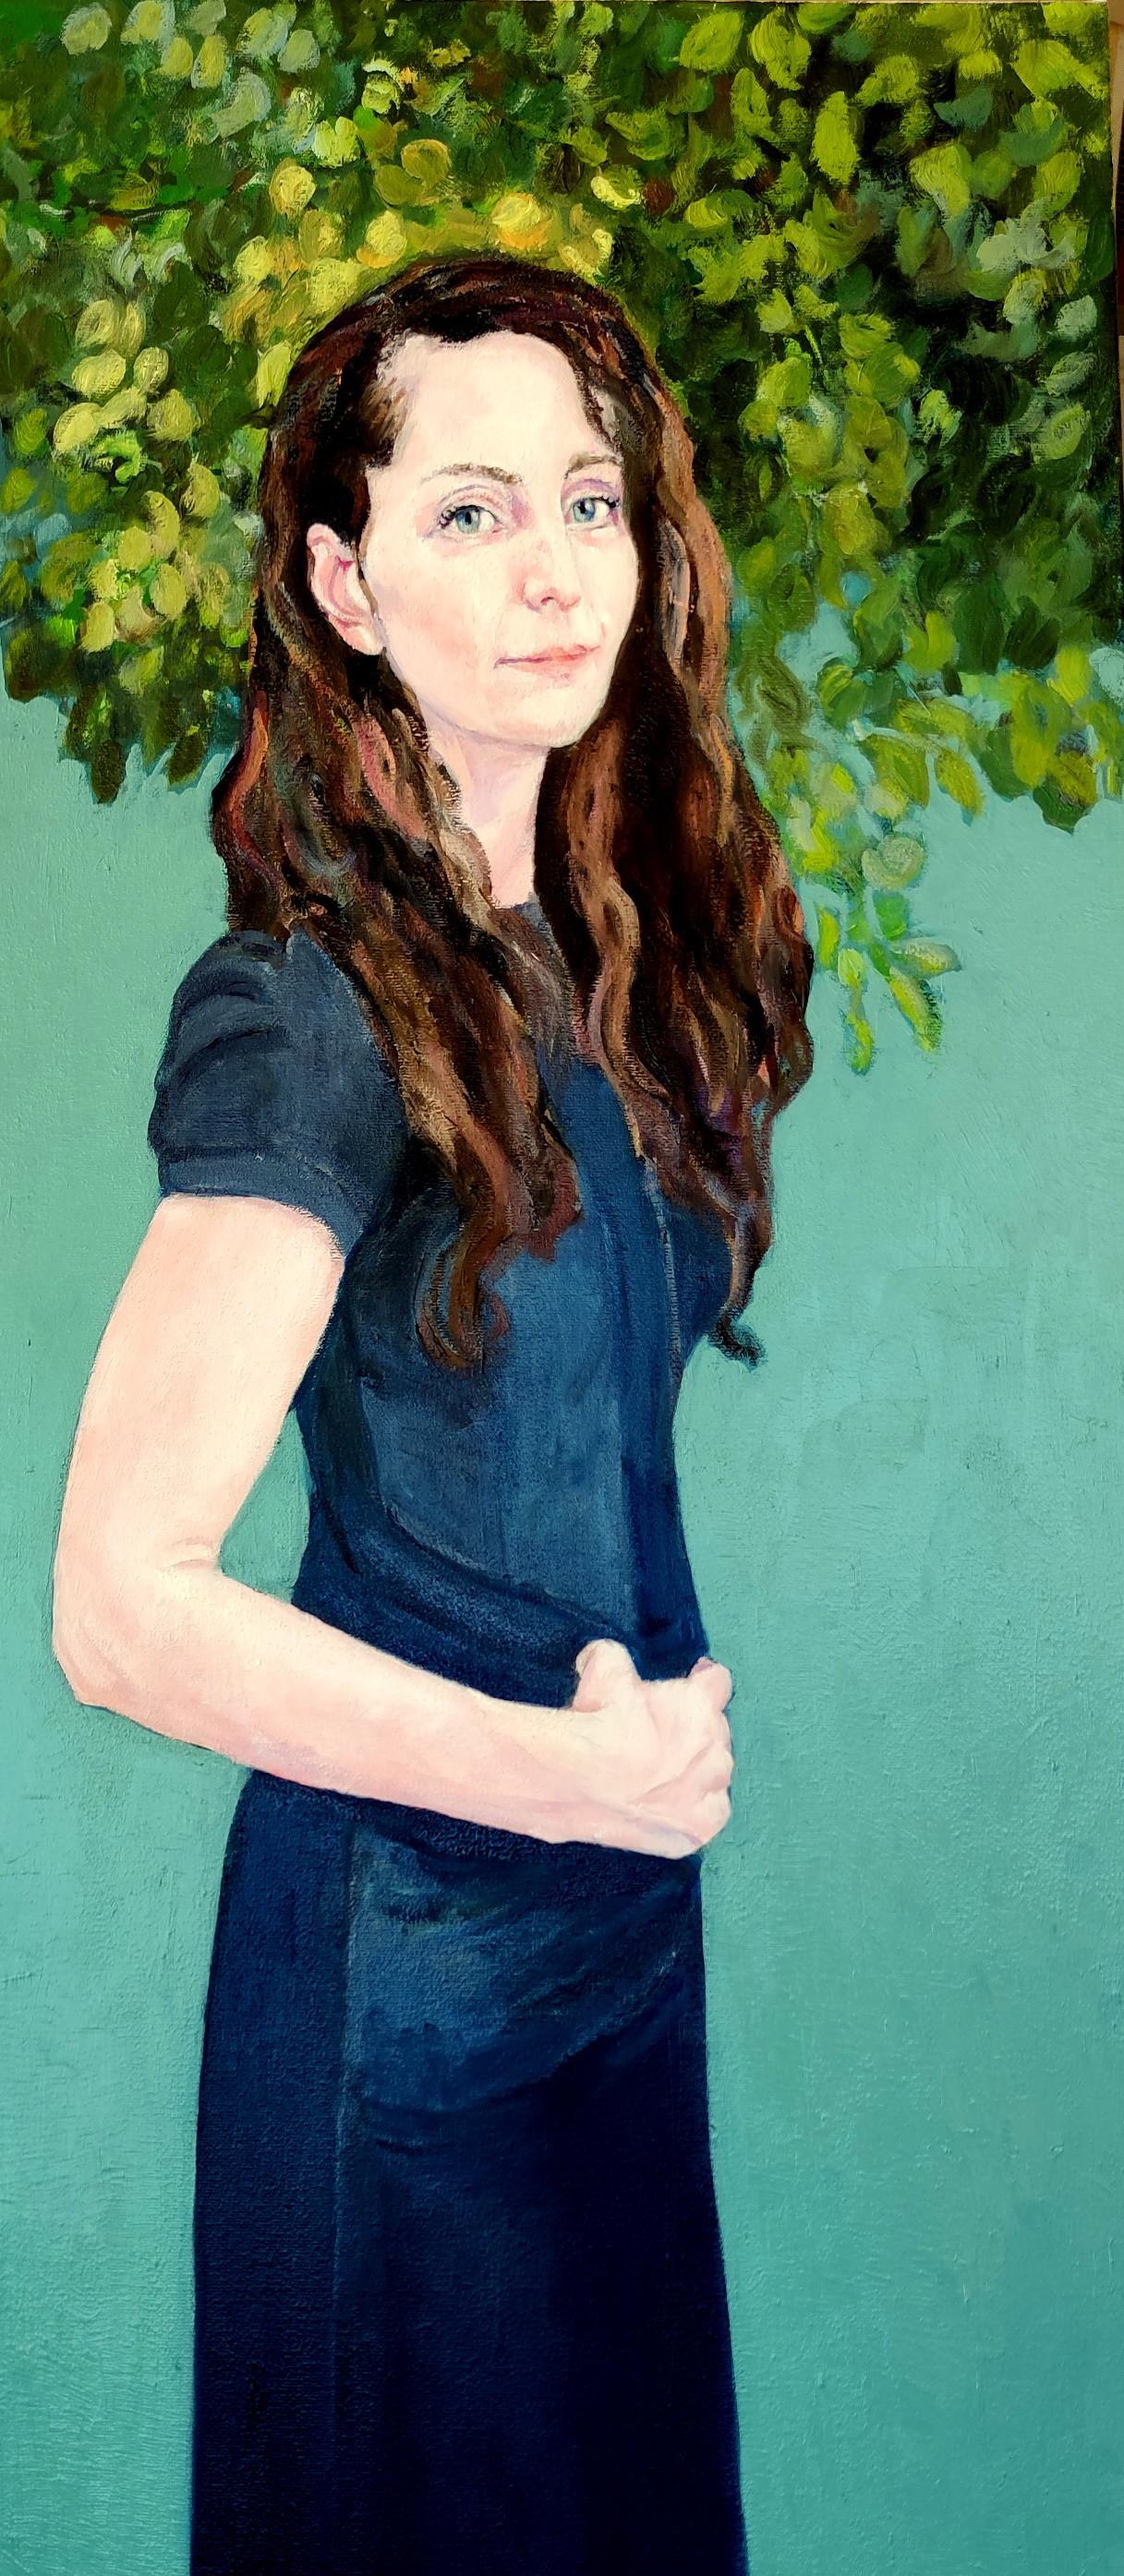 Lubalem - Portrait of young woman Elina